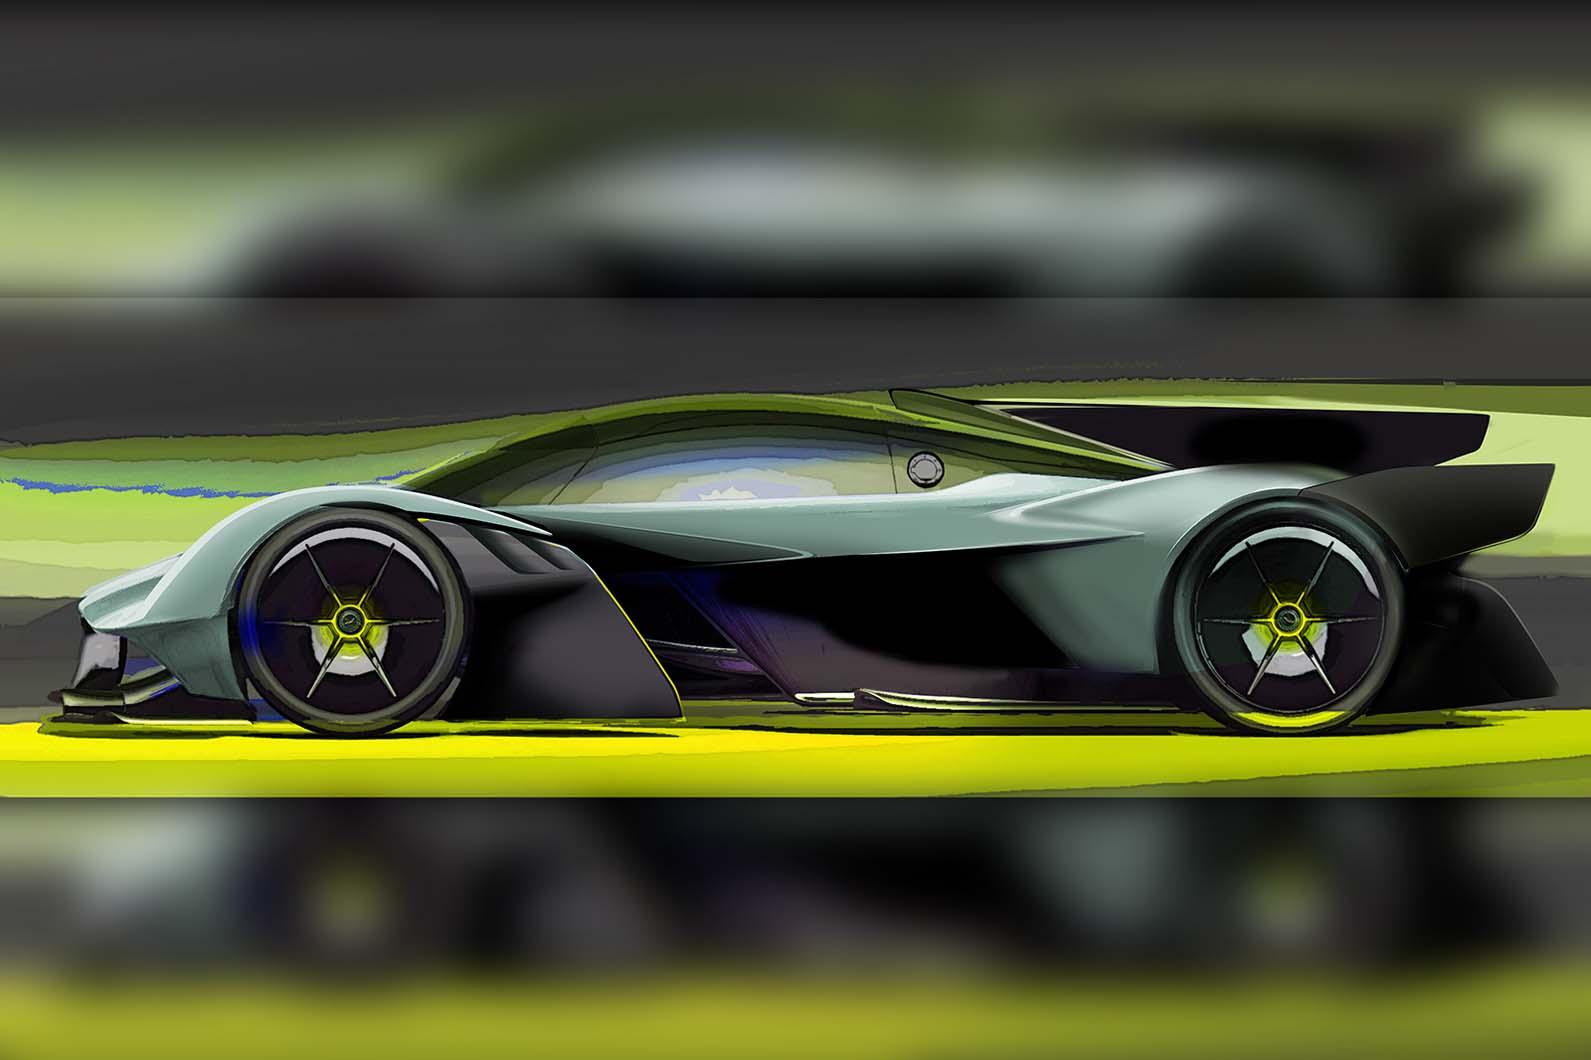 Aston Martin Valkyrie Amr Pro Track Car Revealed Autocar